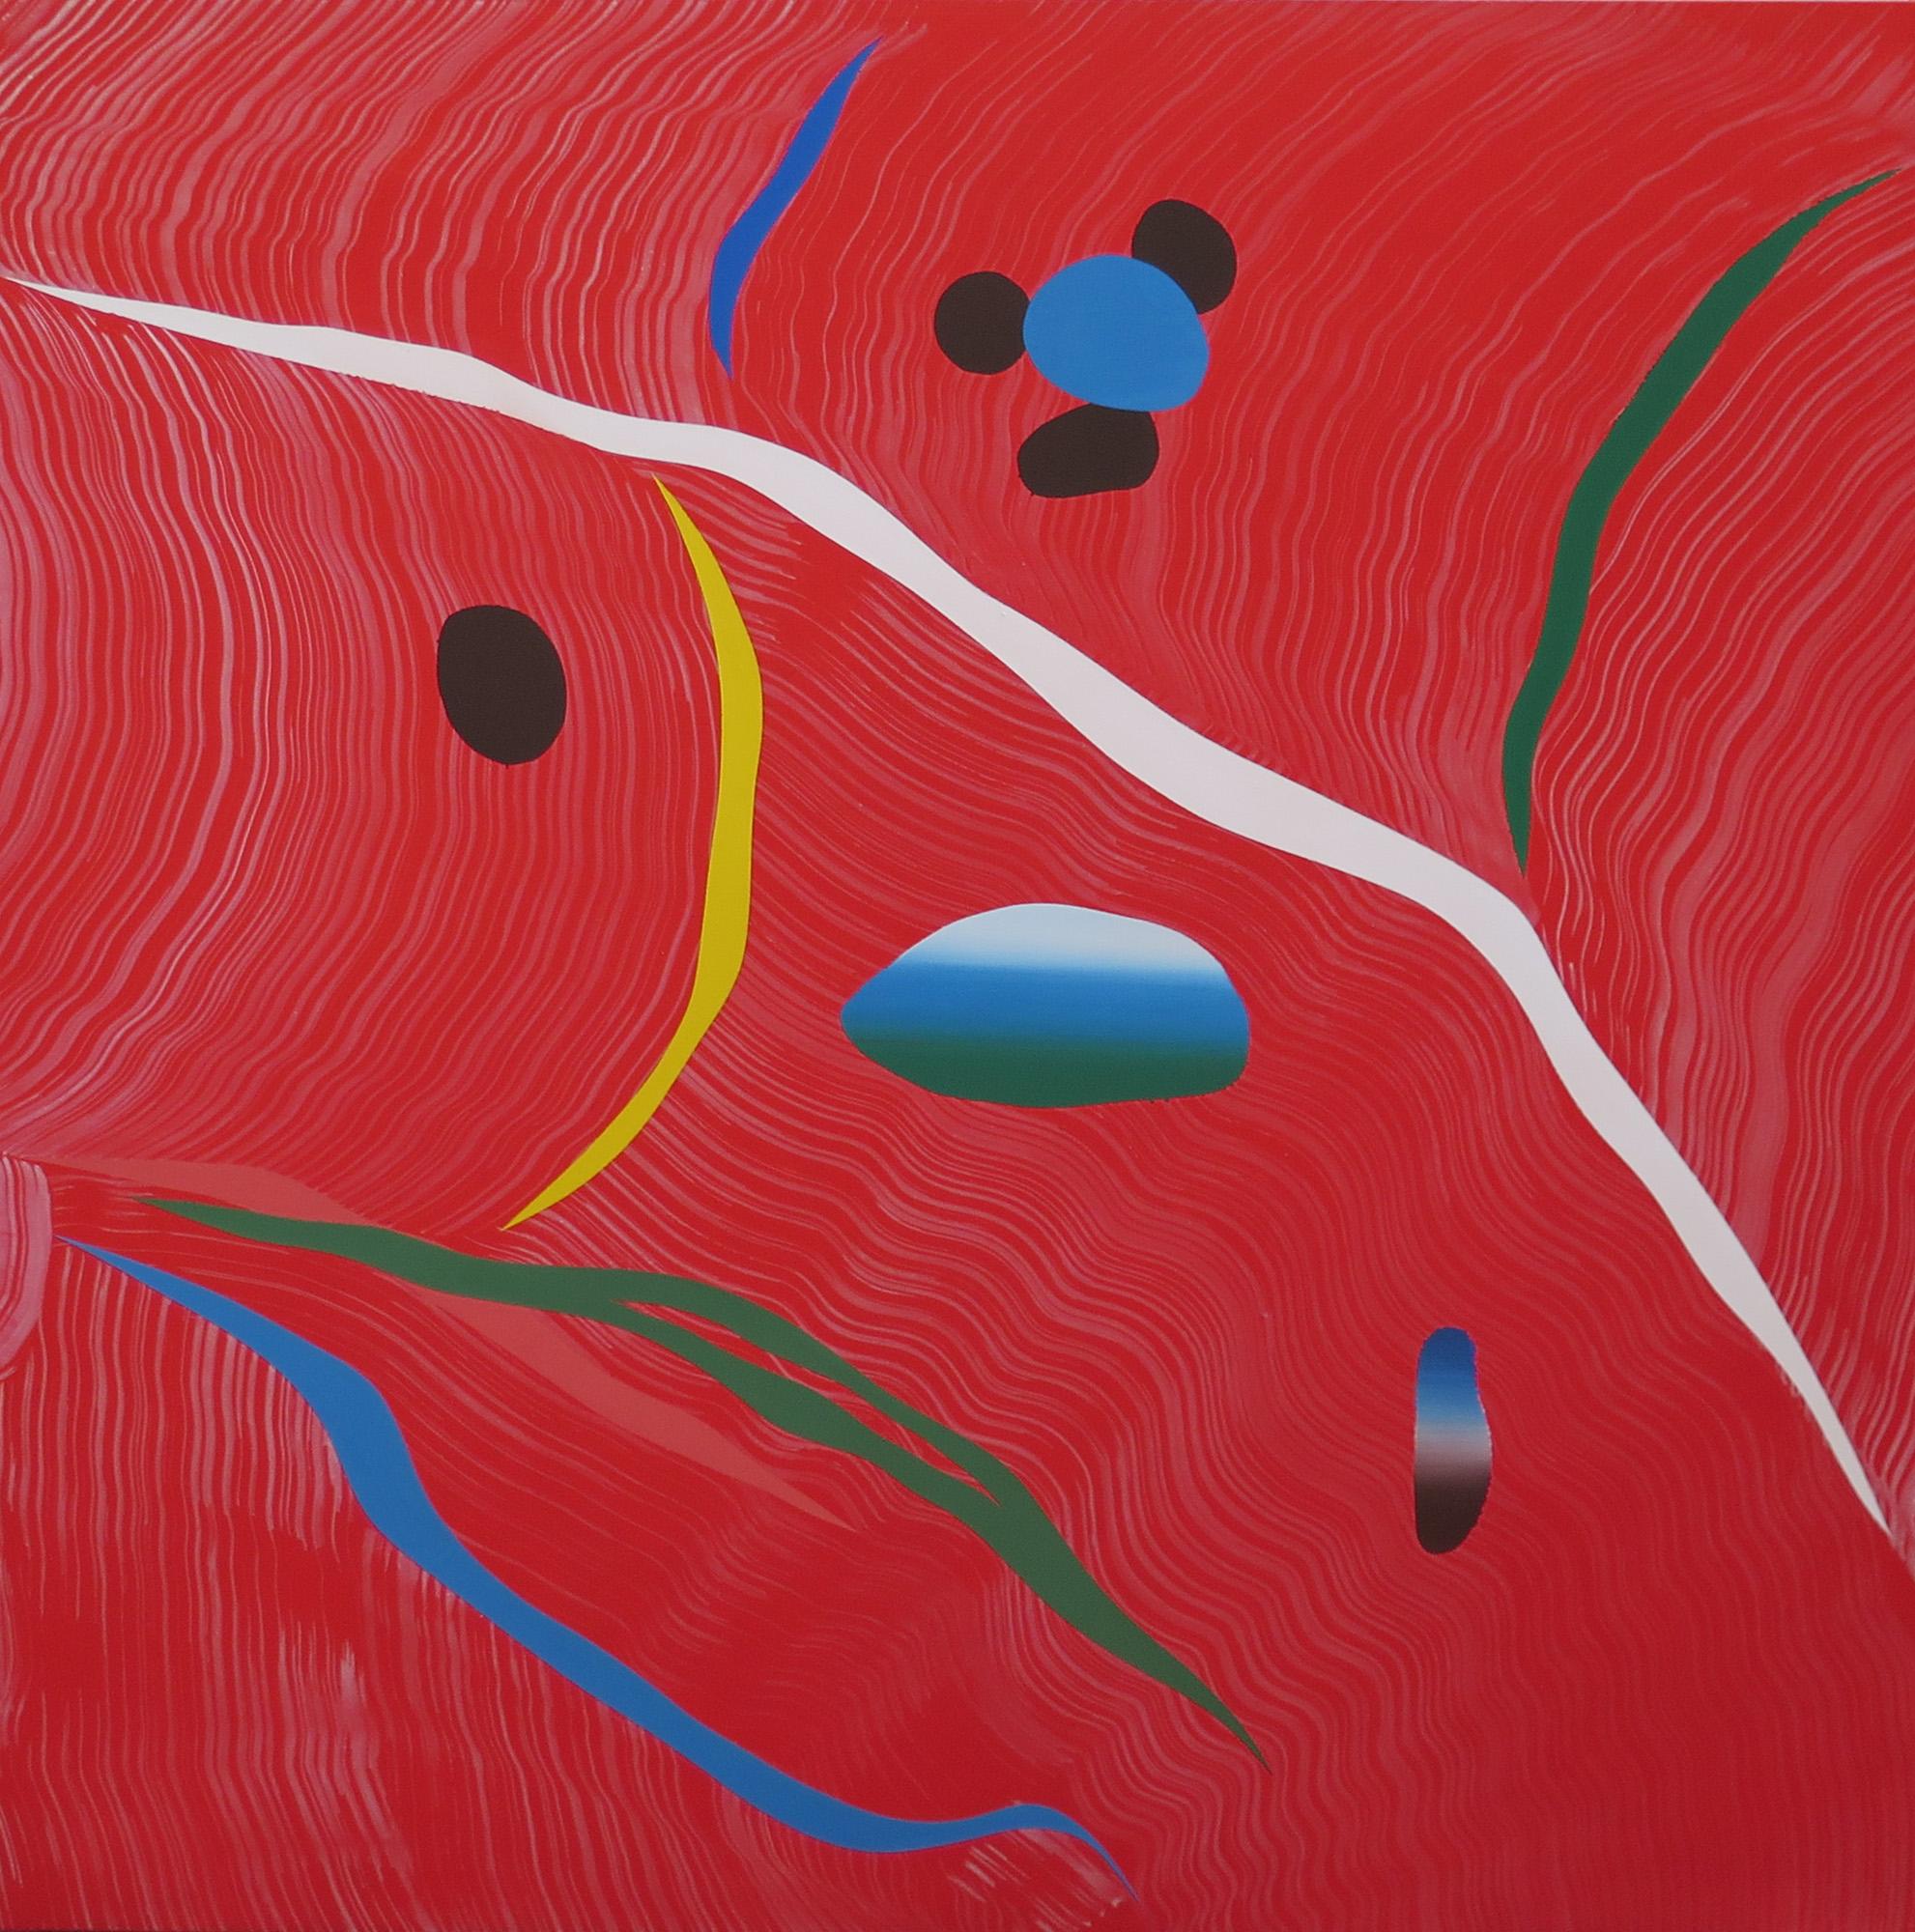 Mundos 15, (215032), 2015. Acrílico sobre lienzo, 150 x 150 cm.